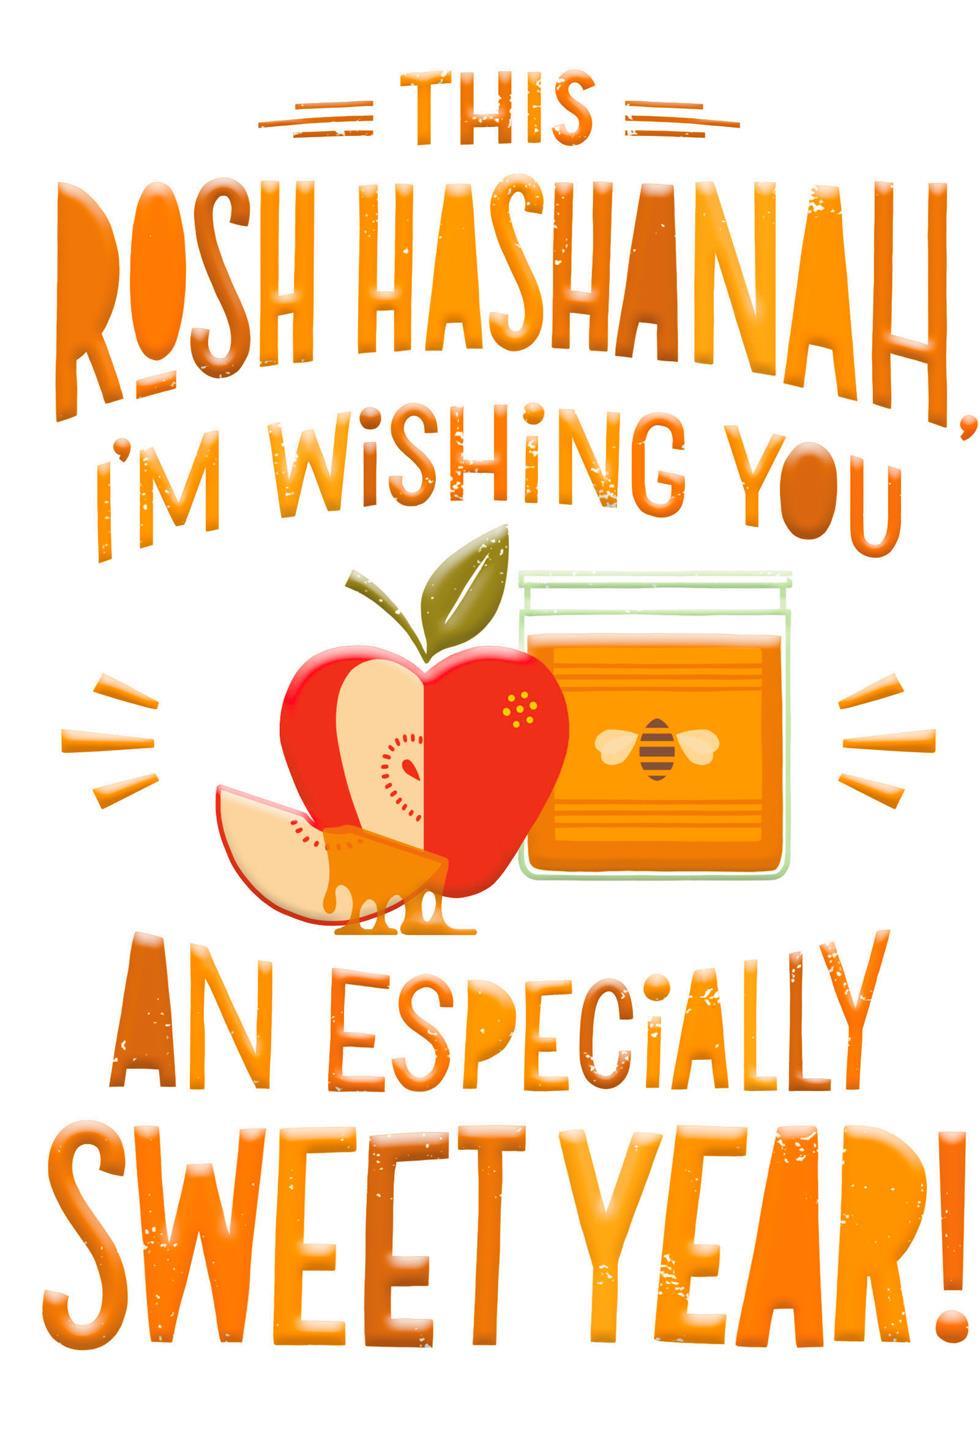 A Super Sweet Year Funny Rosh Hashanah Card Greeting Cards Hallmark